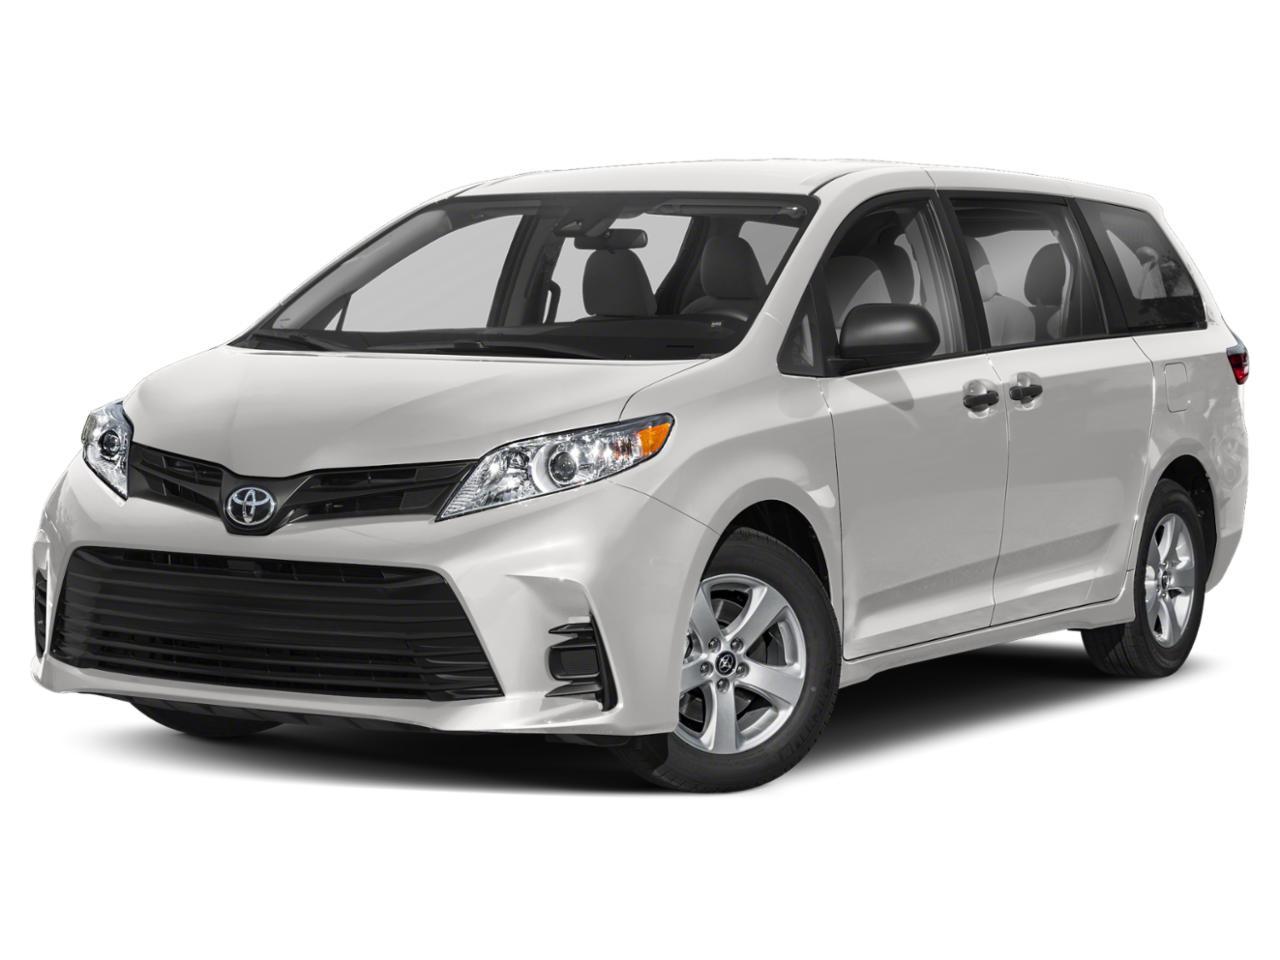 2020 Toyota Sienna Vehicle Photo in Owensboro, KY 42303